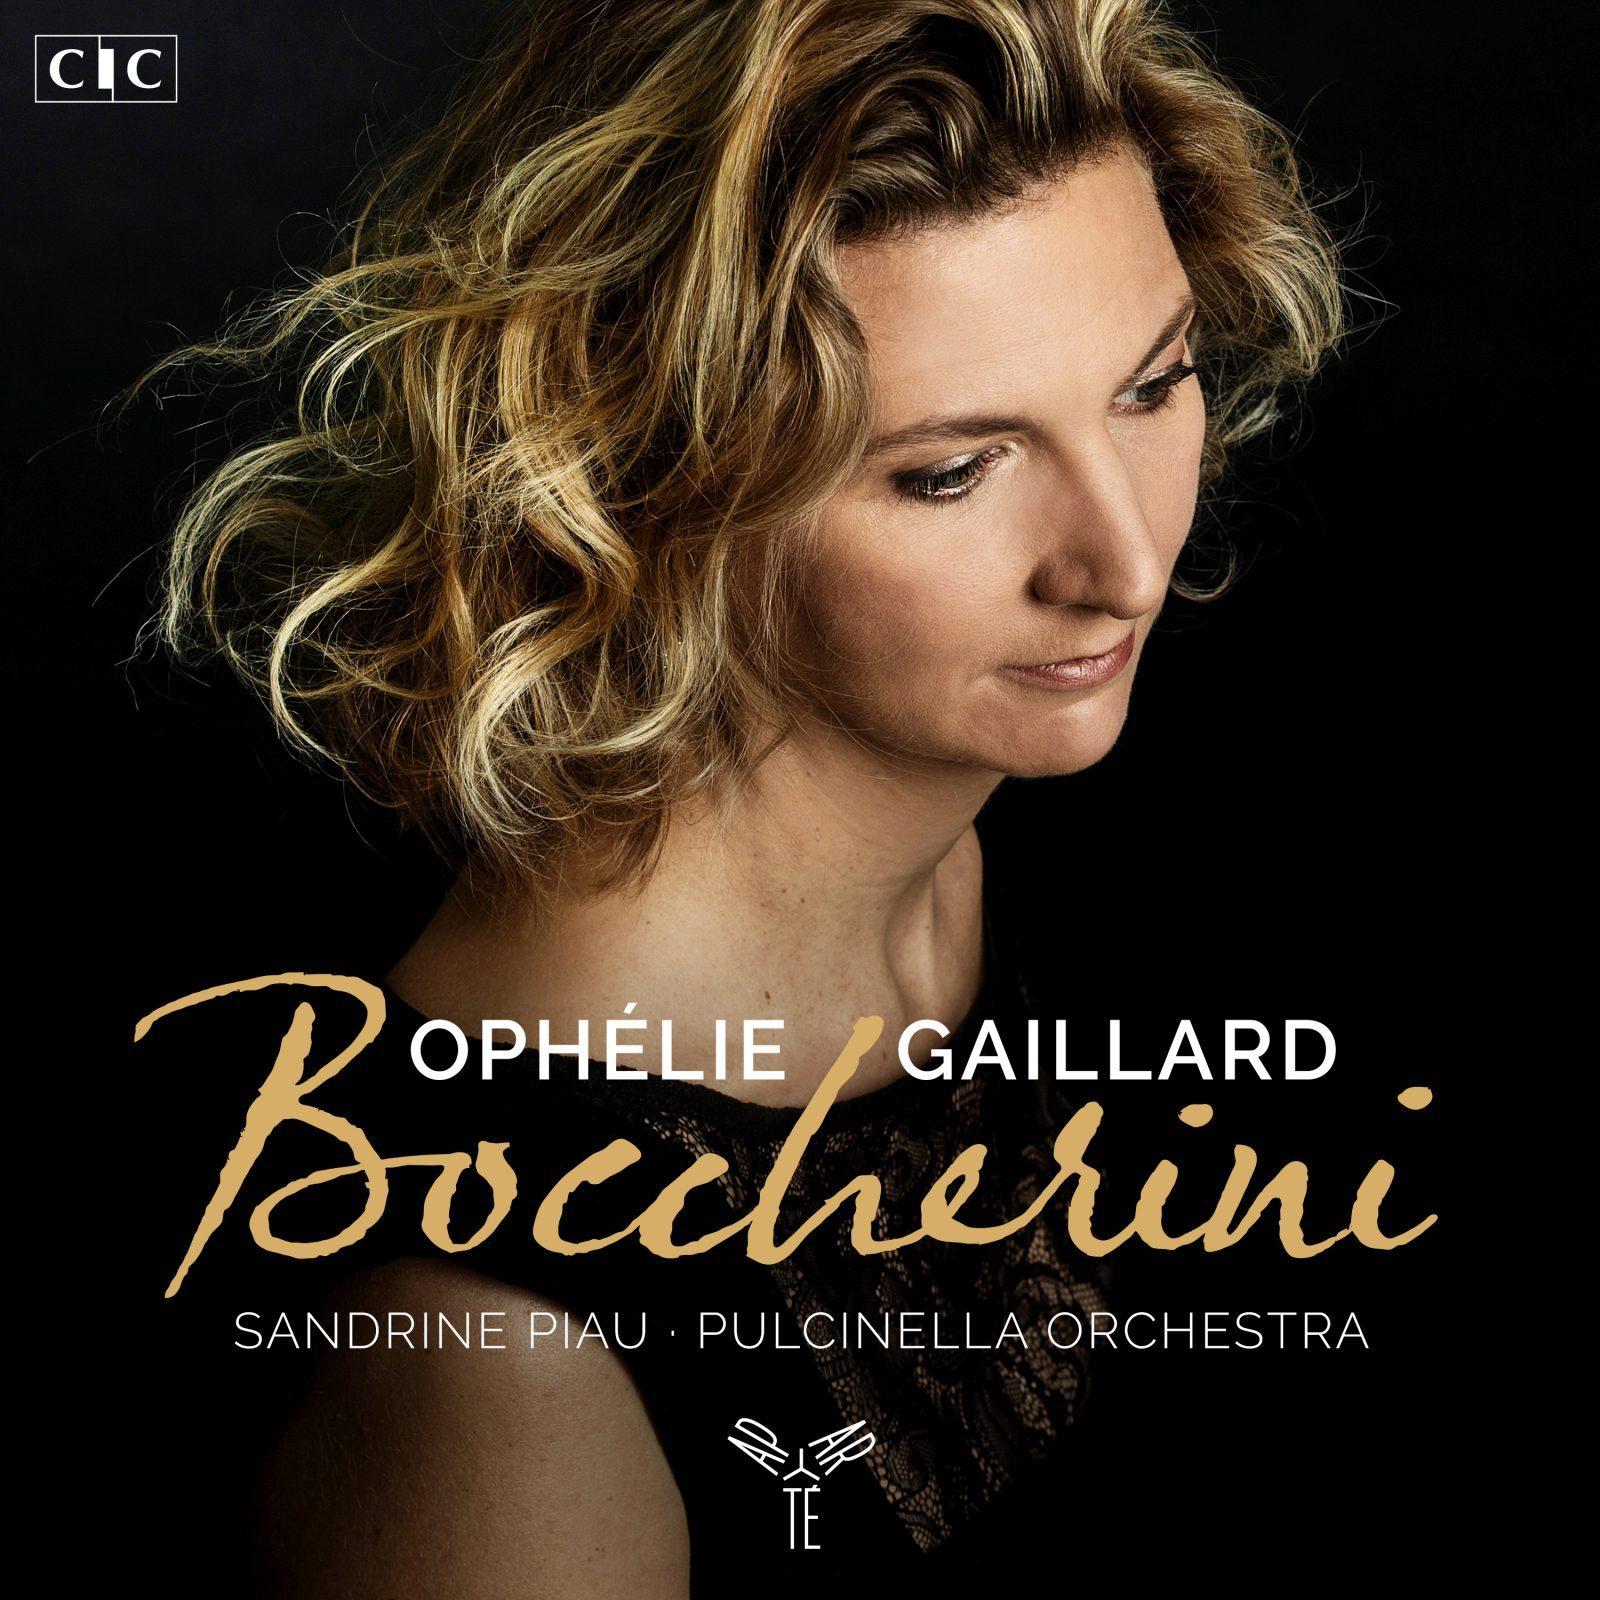 Boccherini Ophélie Gaillard